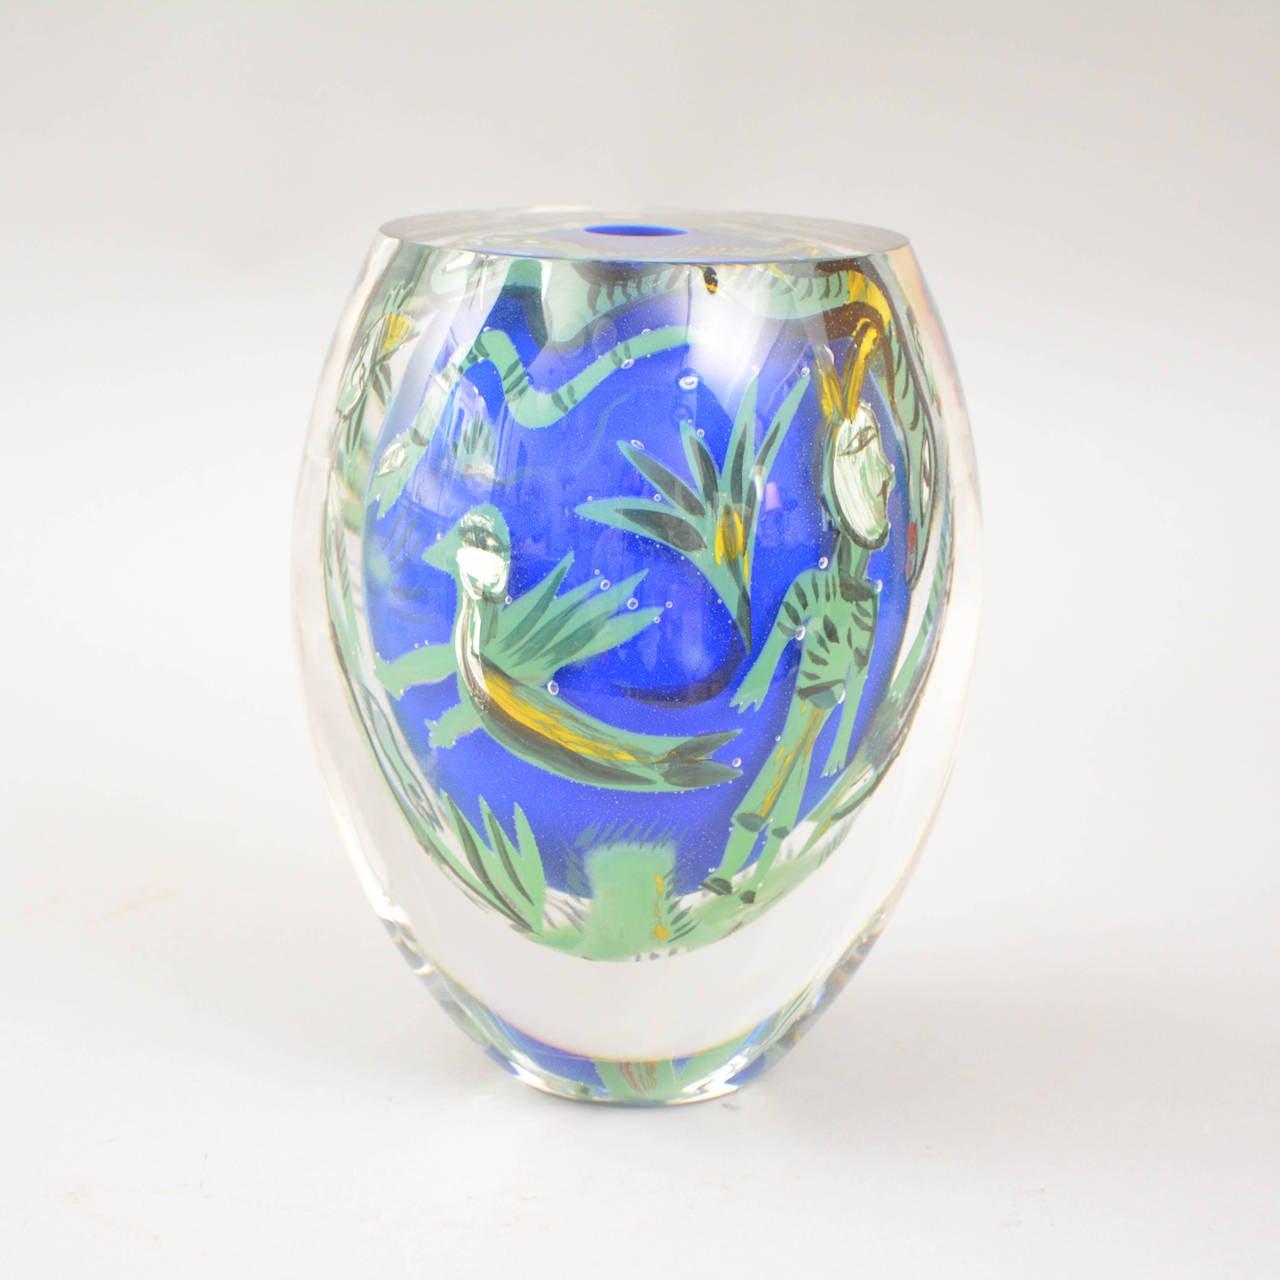 Unique Ulrica Hydman Vallien Kabale Vase For Kosta Boda